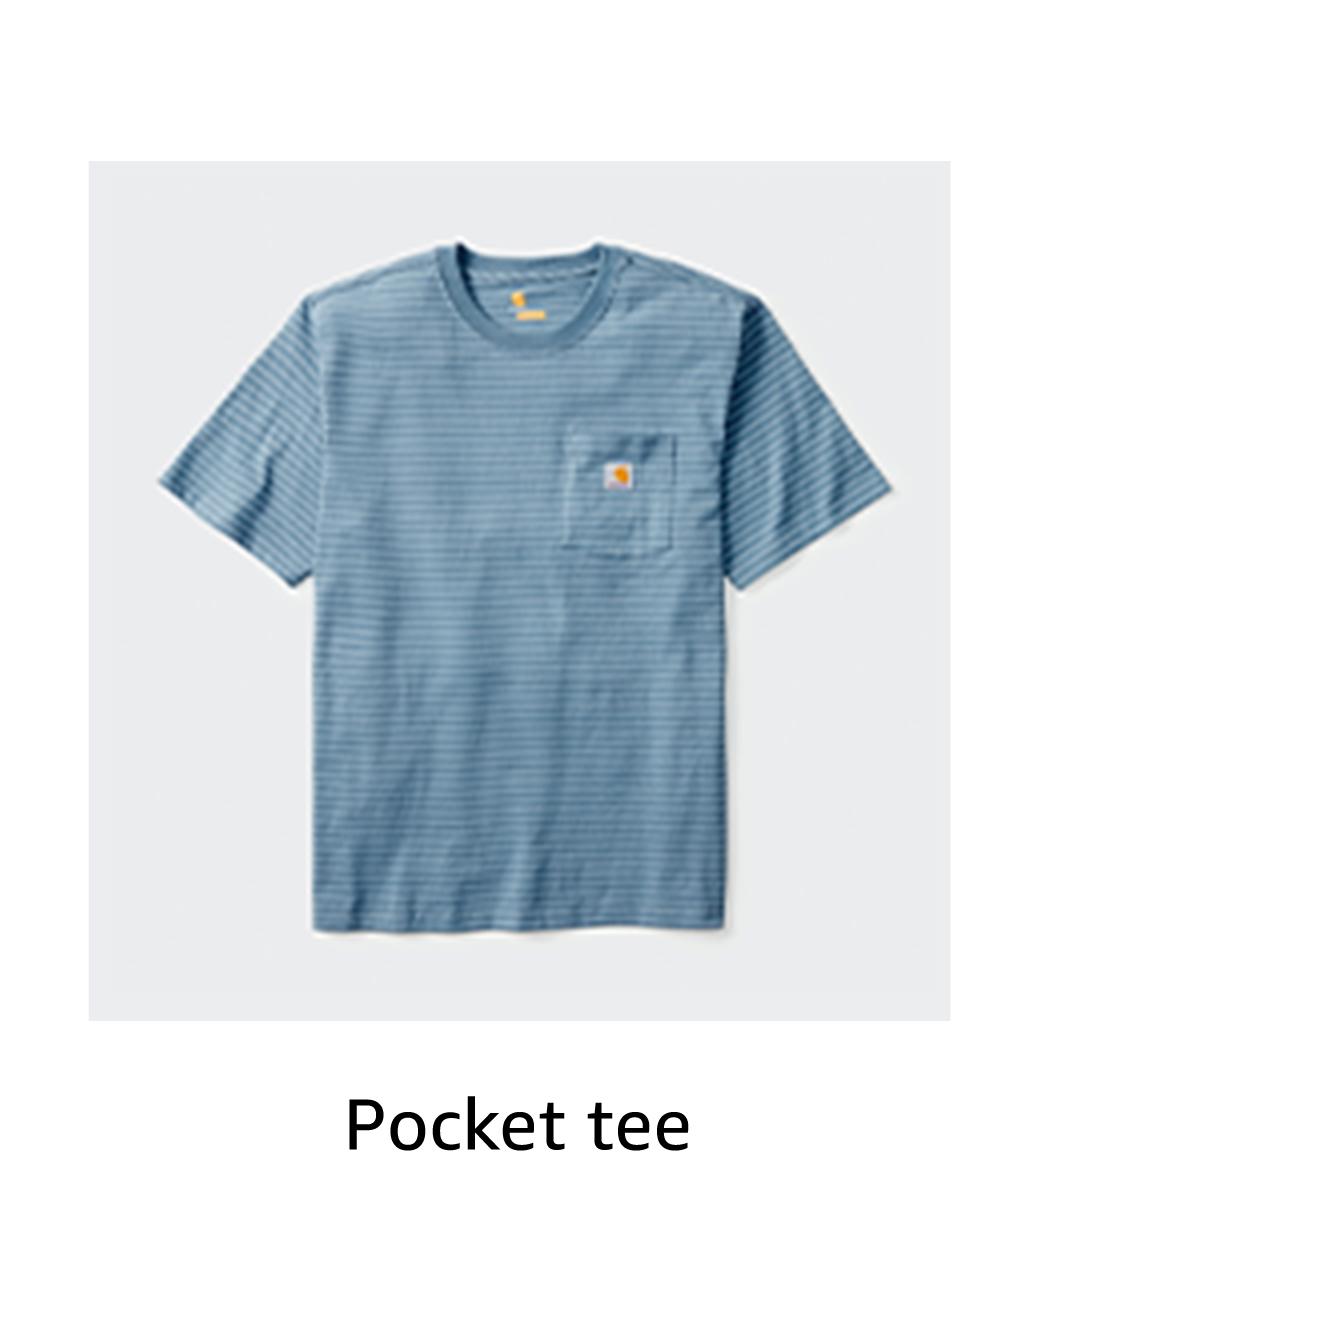 Pocket tee